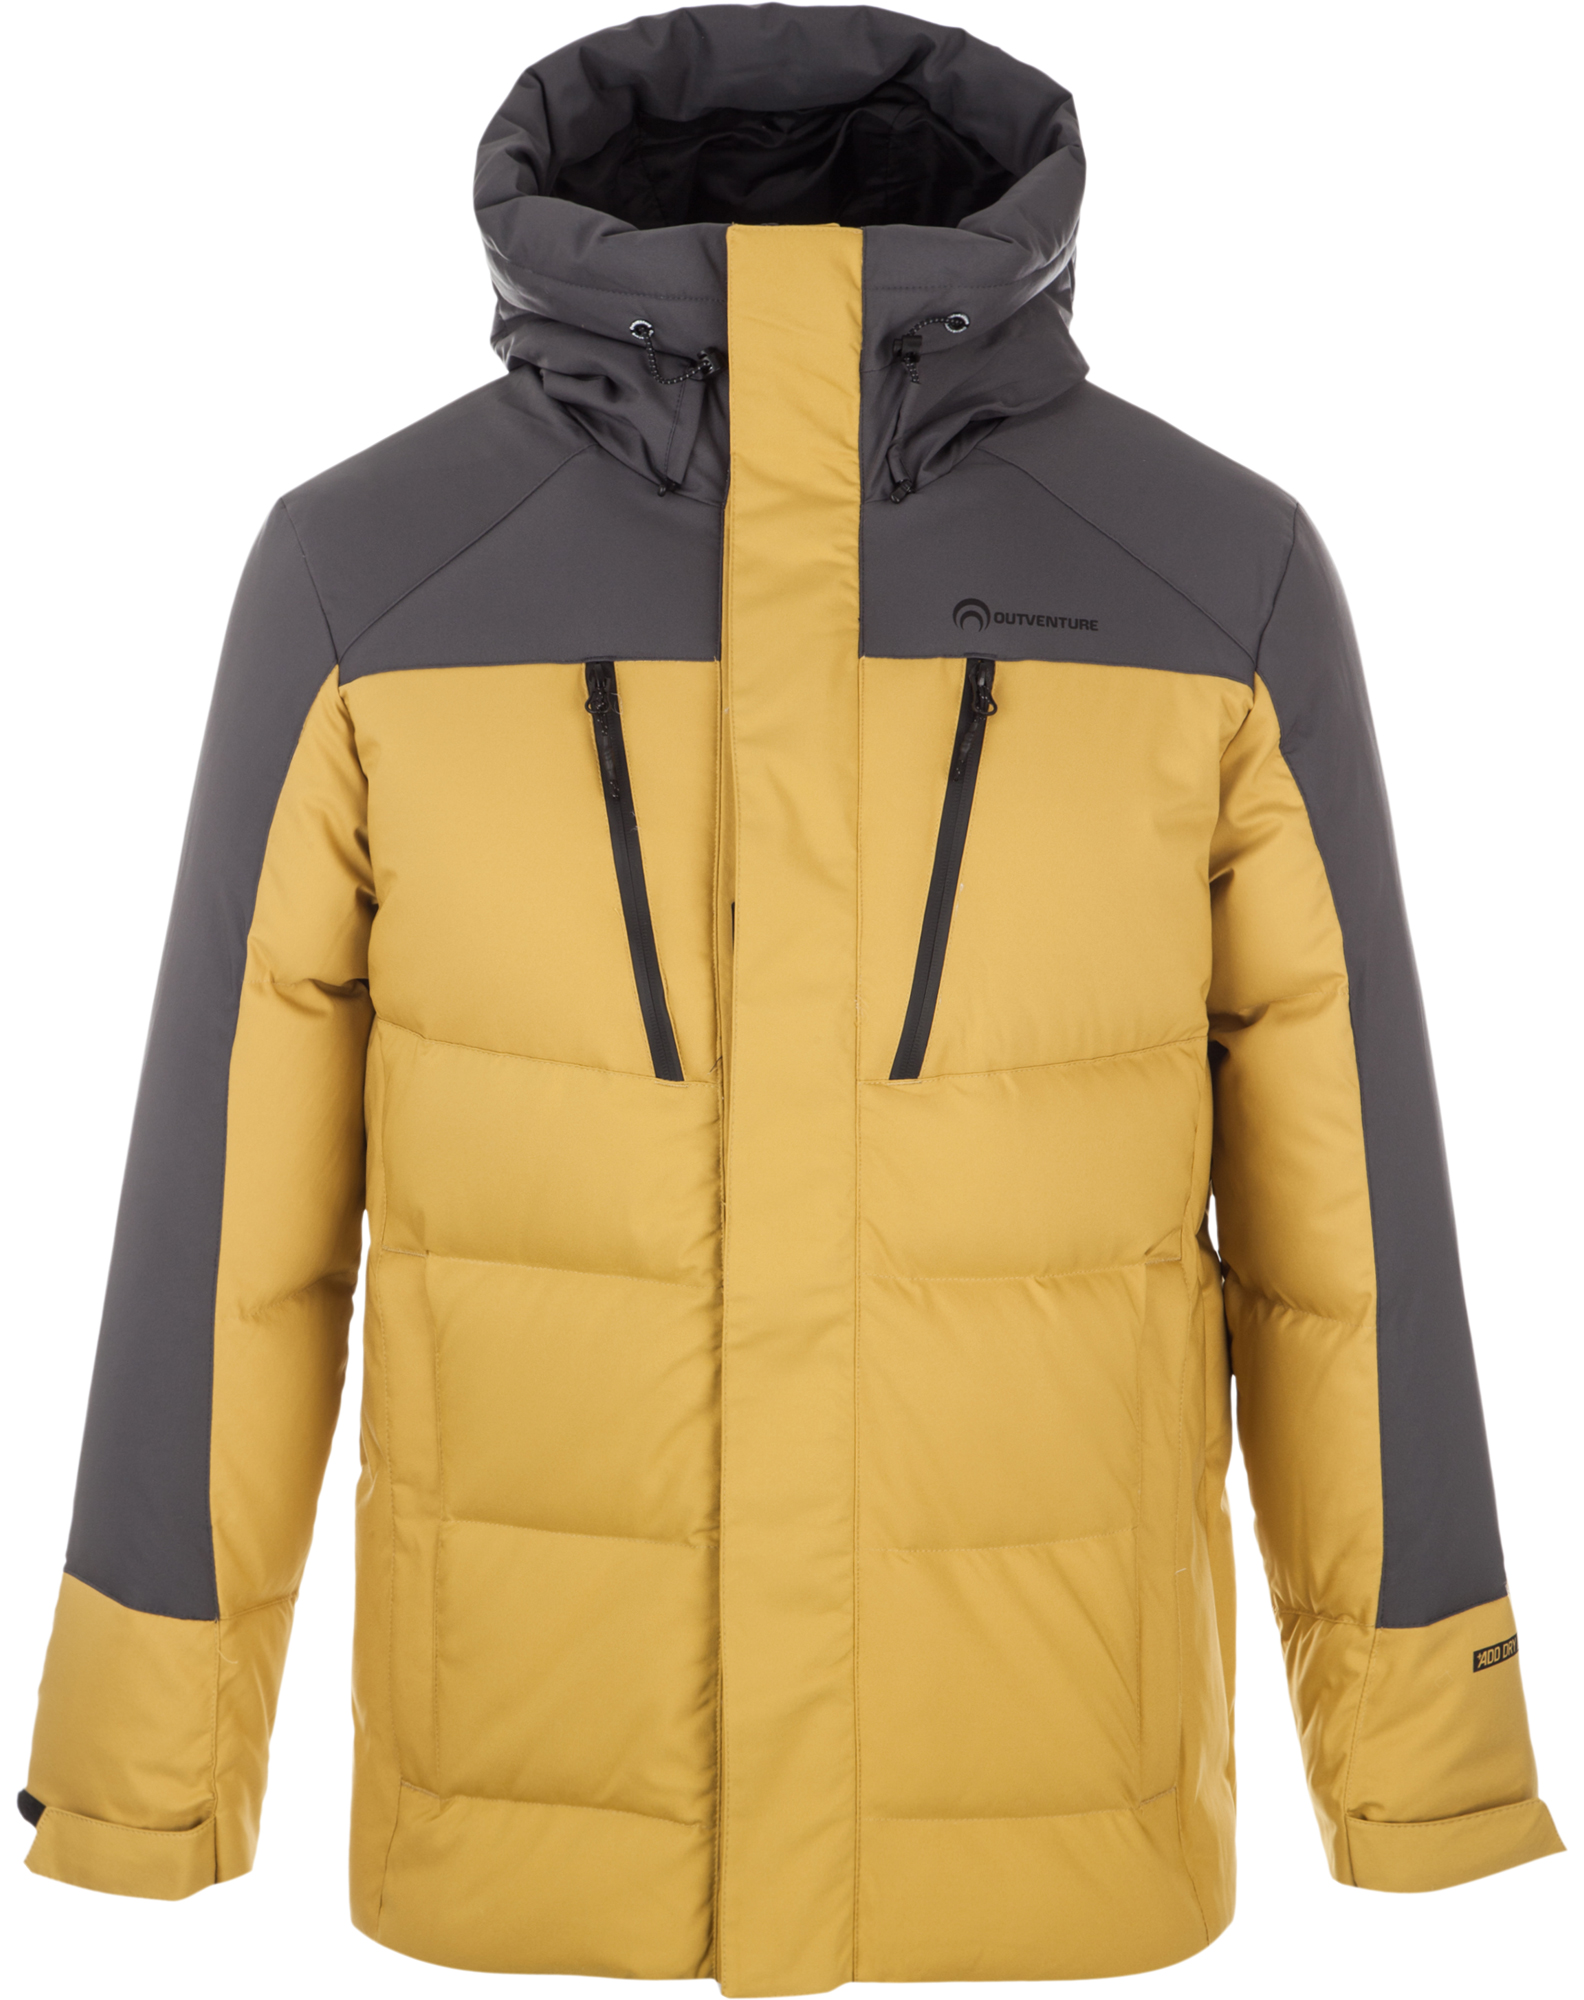 Outventure Куртка пуховая мужская Outventure outventure куртка 3 в 1 мужская outventure